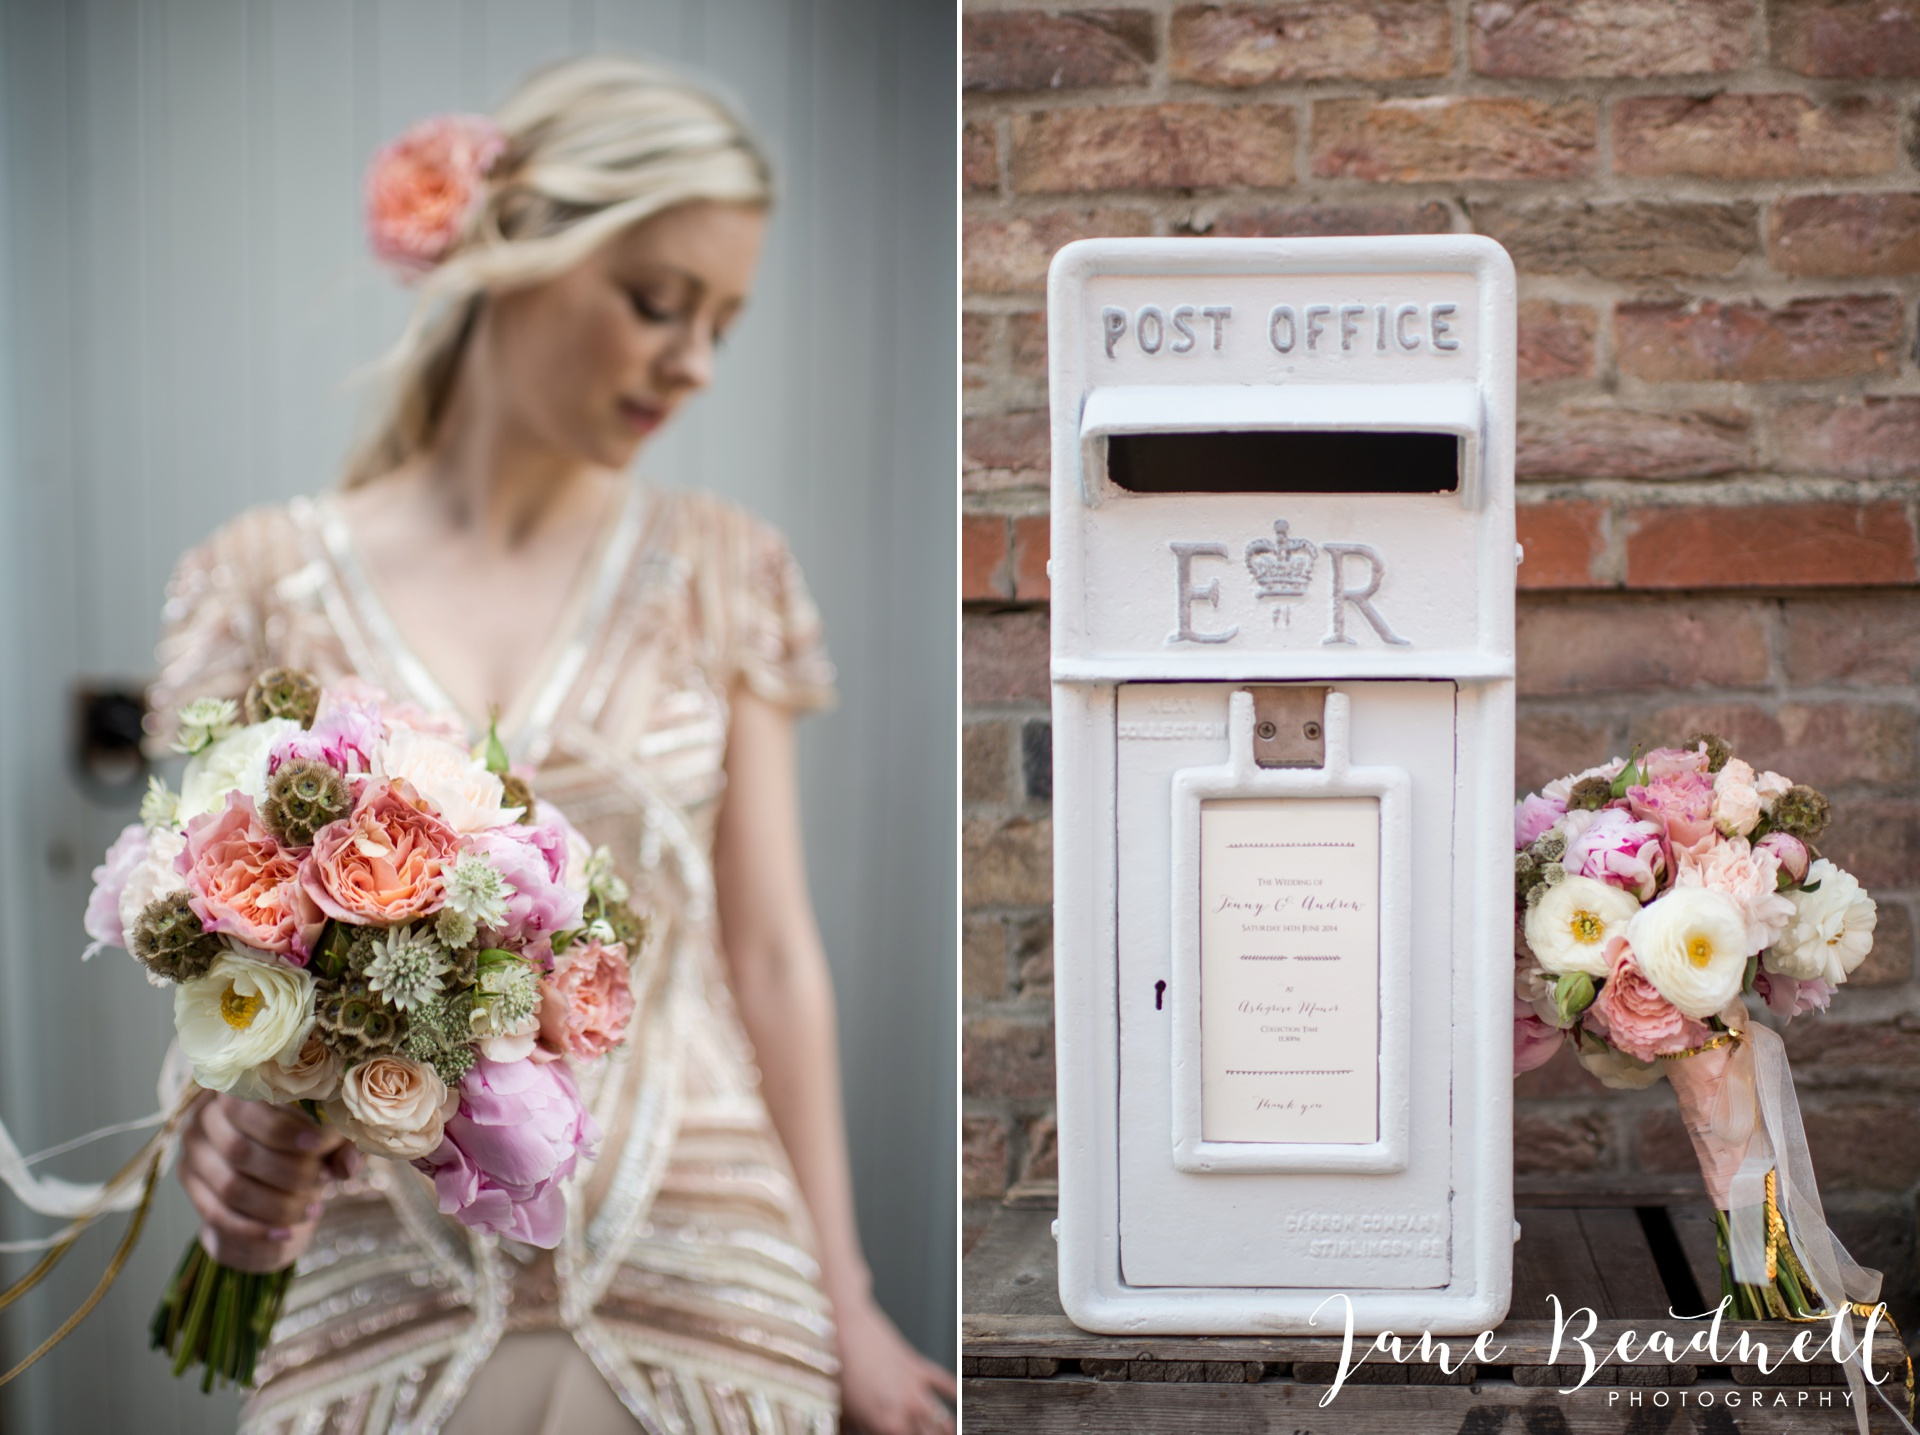 Jane Beadnell fine art wedding photographer York Bridal Photo Shoot_0019